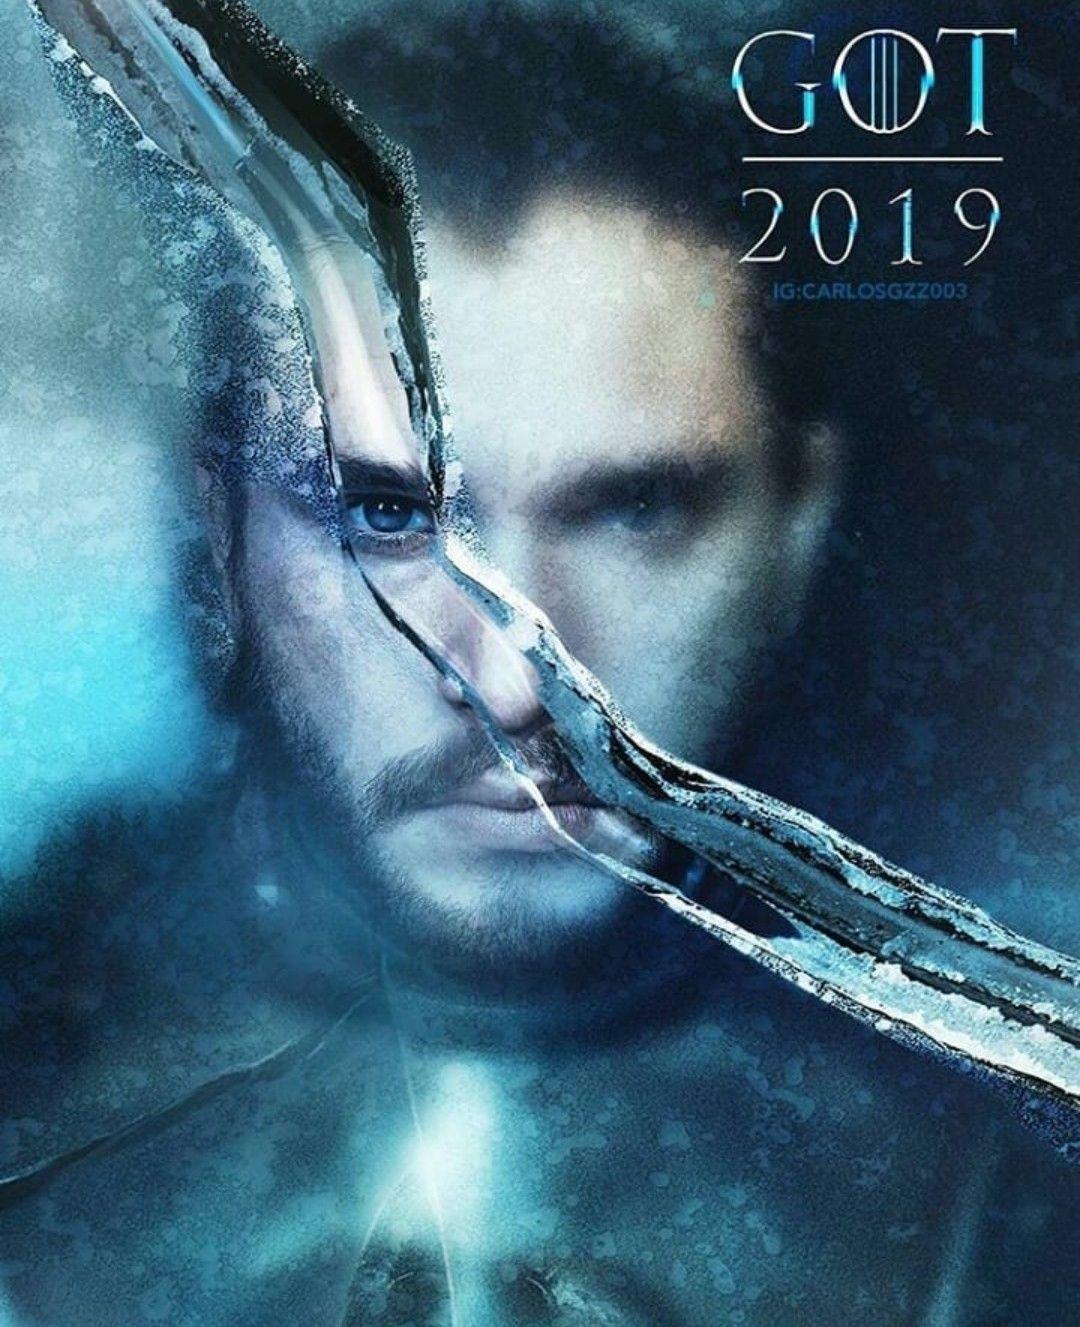 I Love It Jon Snow Watch Game Of Thrones Season 8